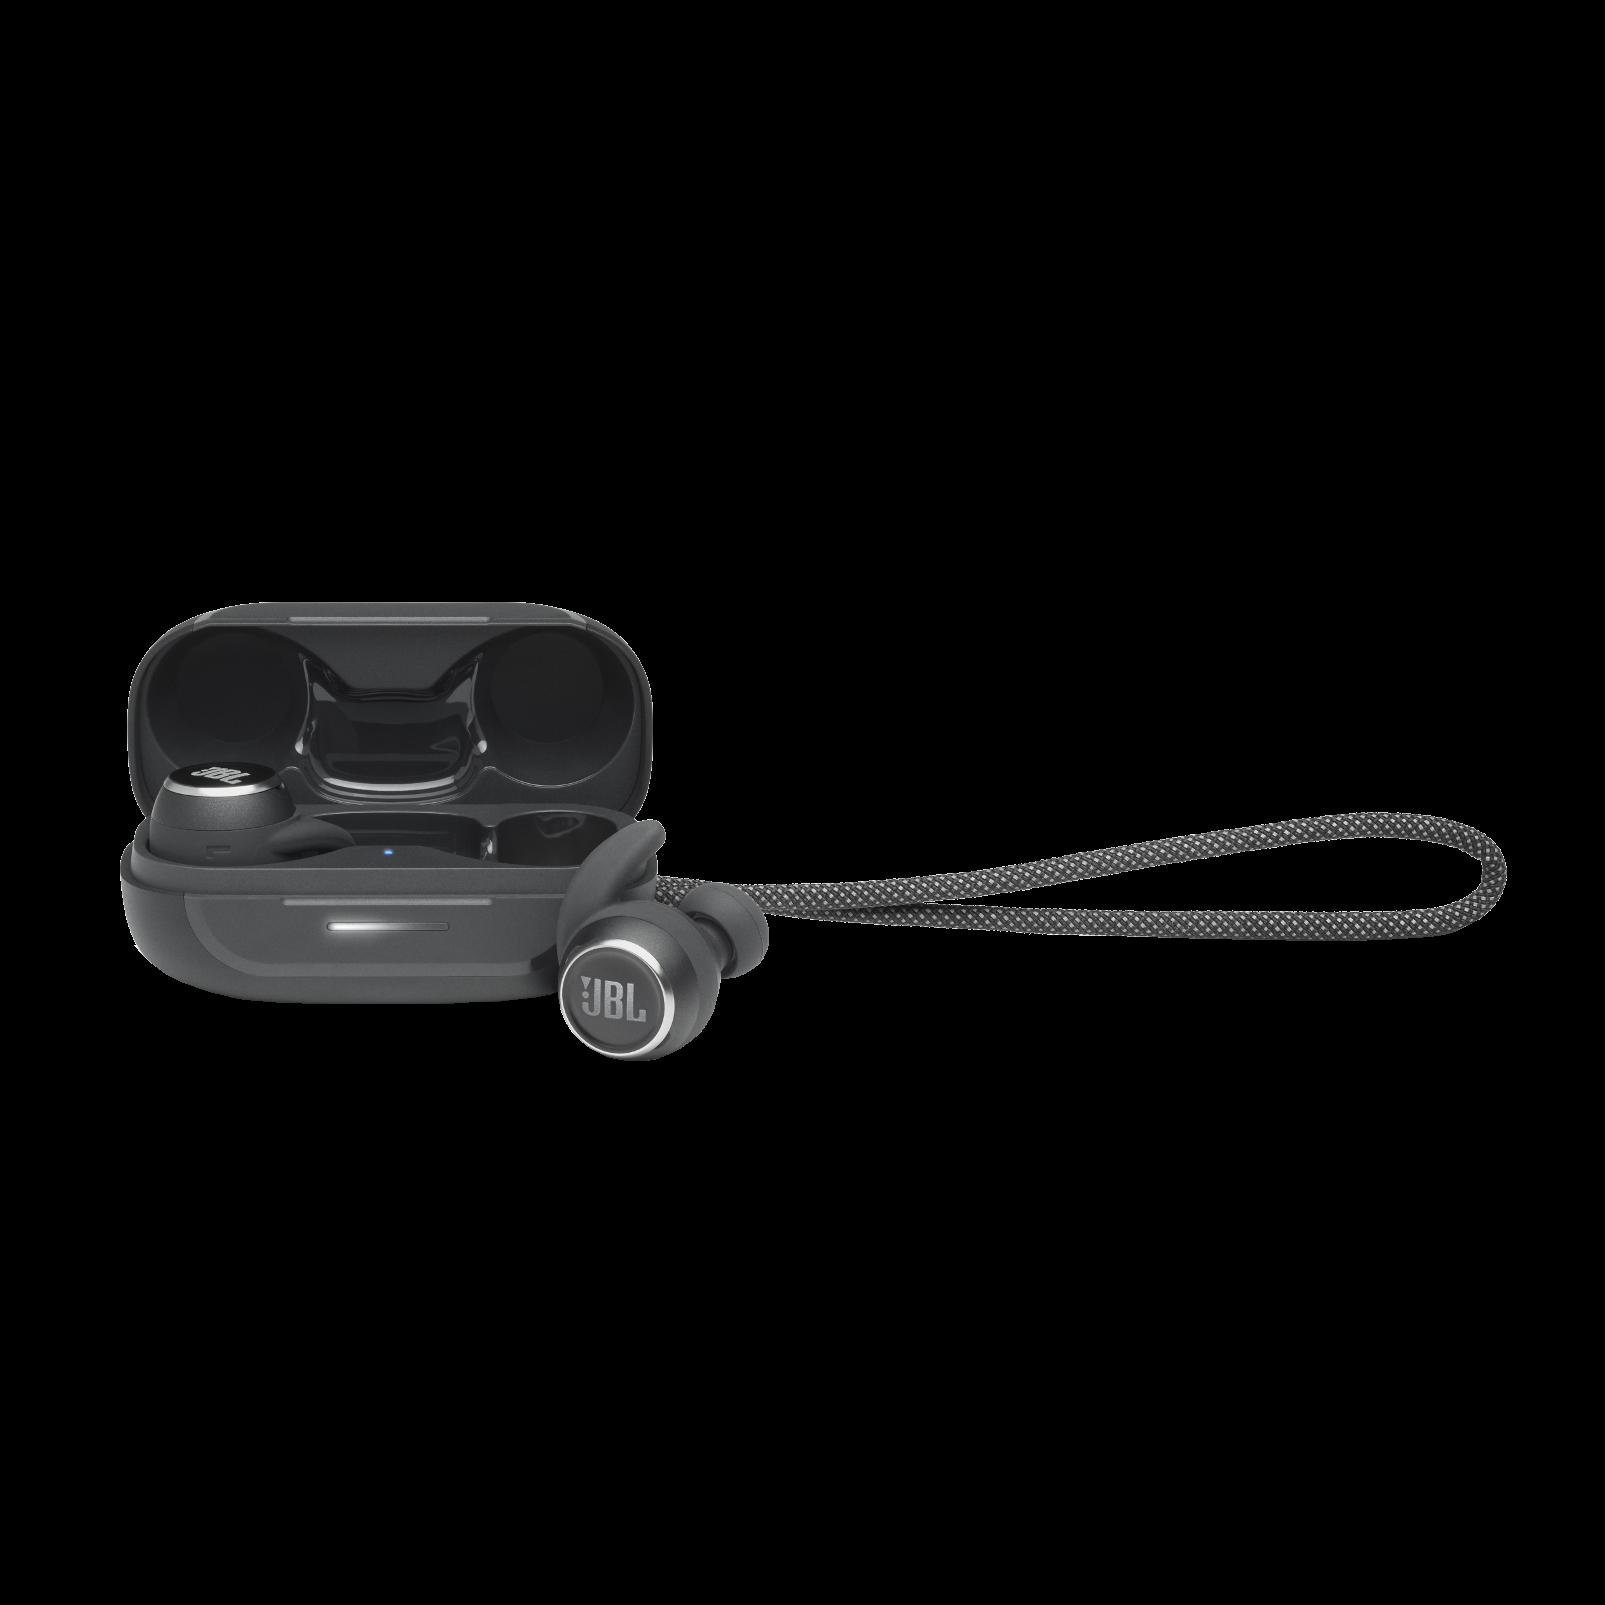 JBL Reflect Mini NC - Black - Waterproof True Wireless In-Ear NC Sport Headphones - Hero